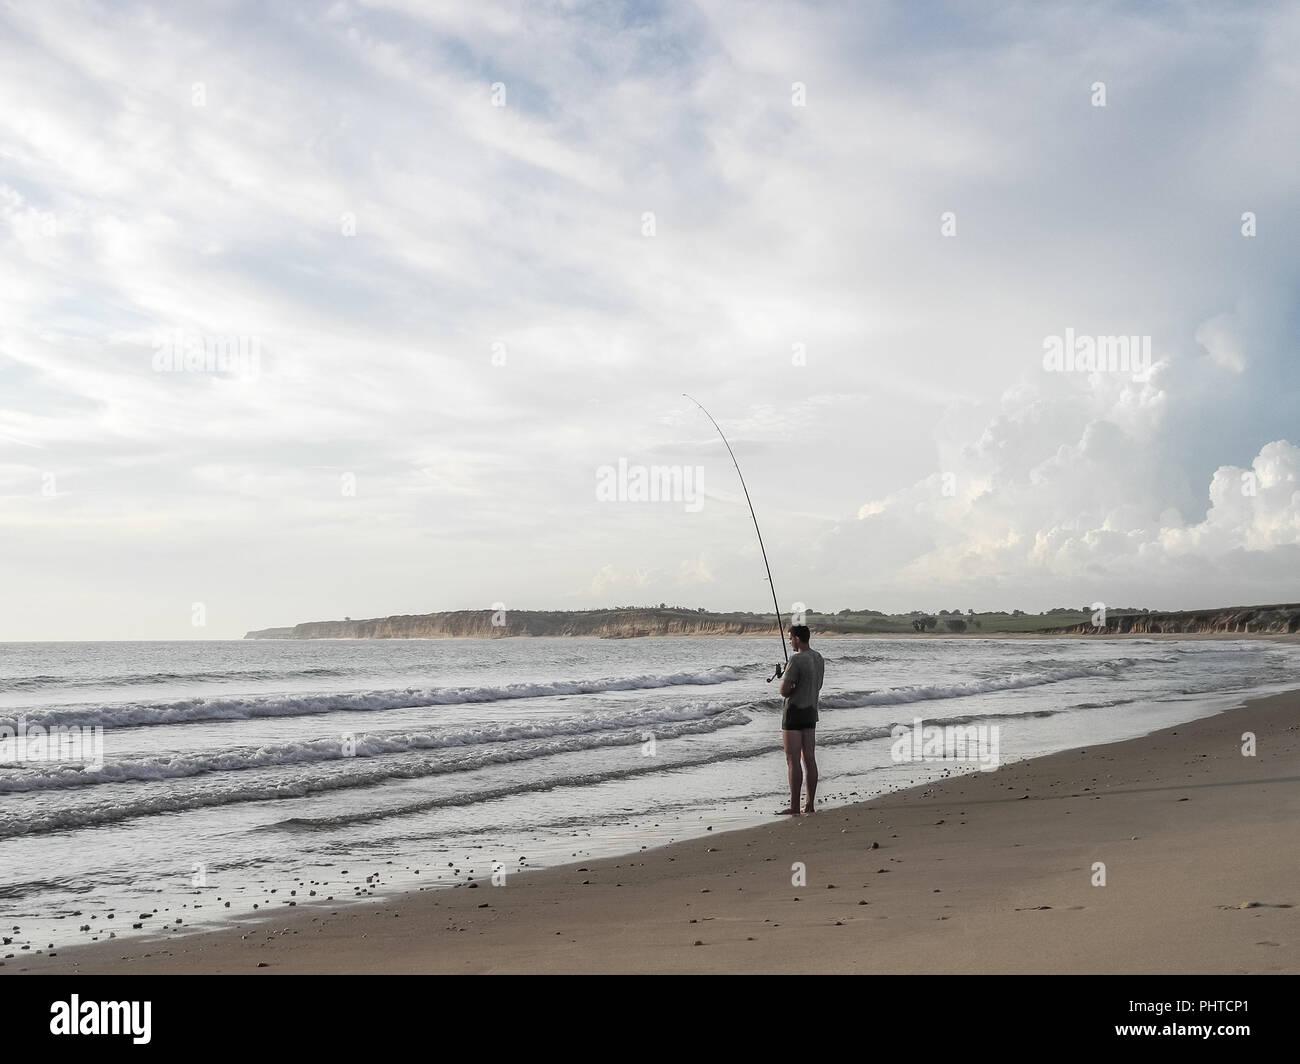 Luanda, Angola - April 26, 2014: Recreational young fisherman standing at beach north of Luanda angling, Angola, Africa. - Stock Image